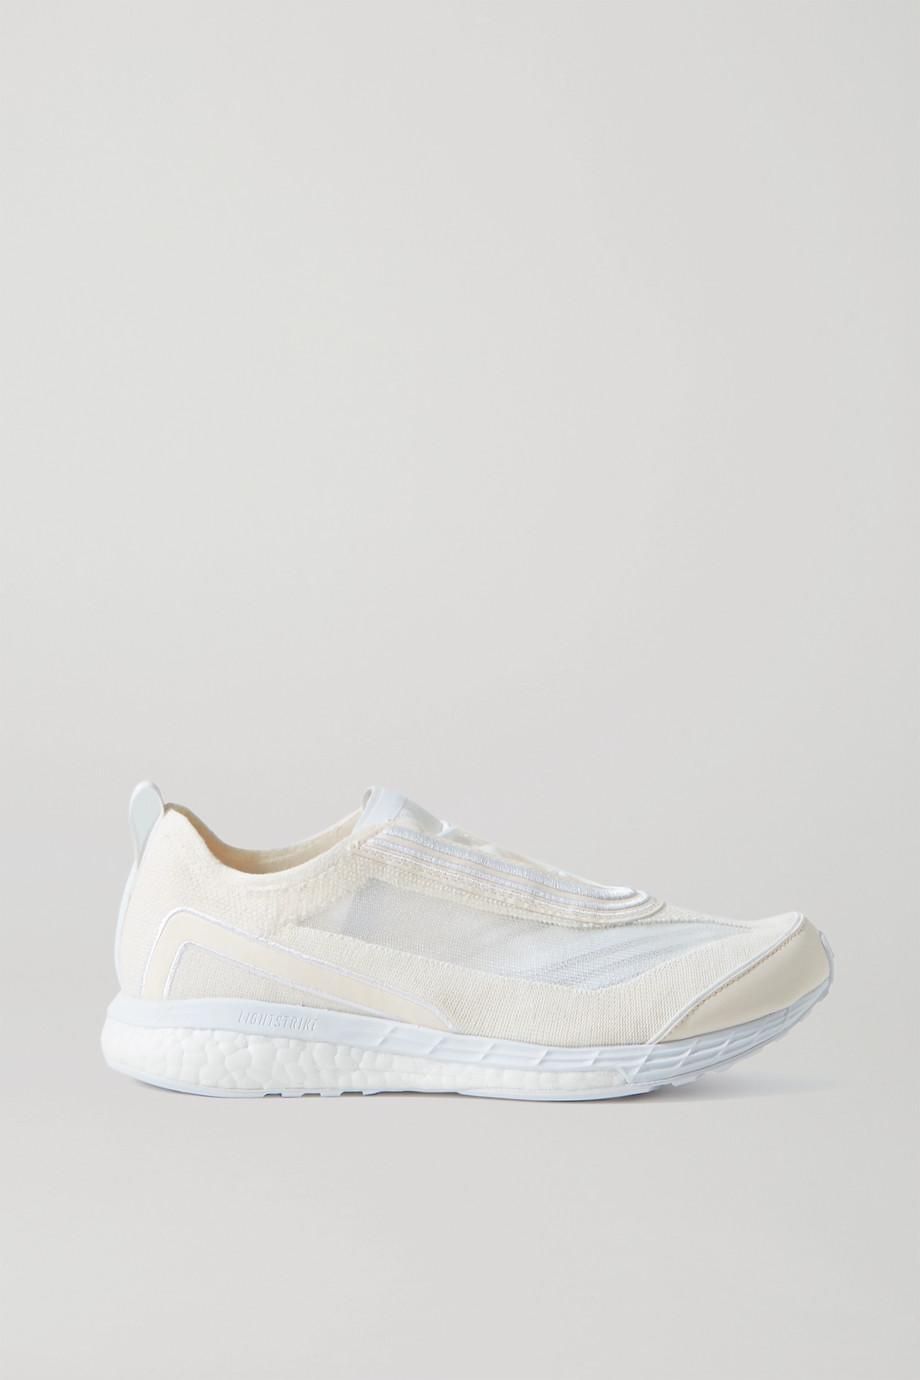 adidas by Stella McCartney Boston mesh and Primeknit sneakers